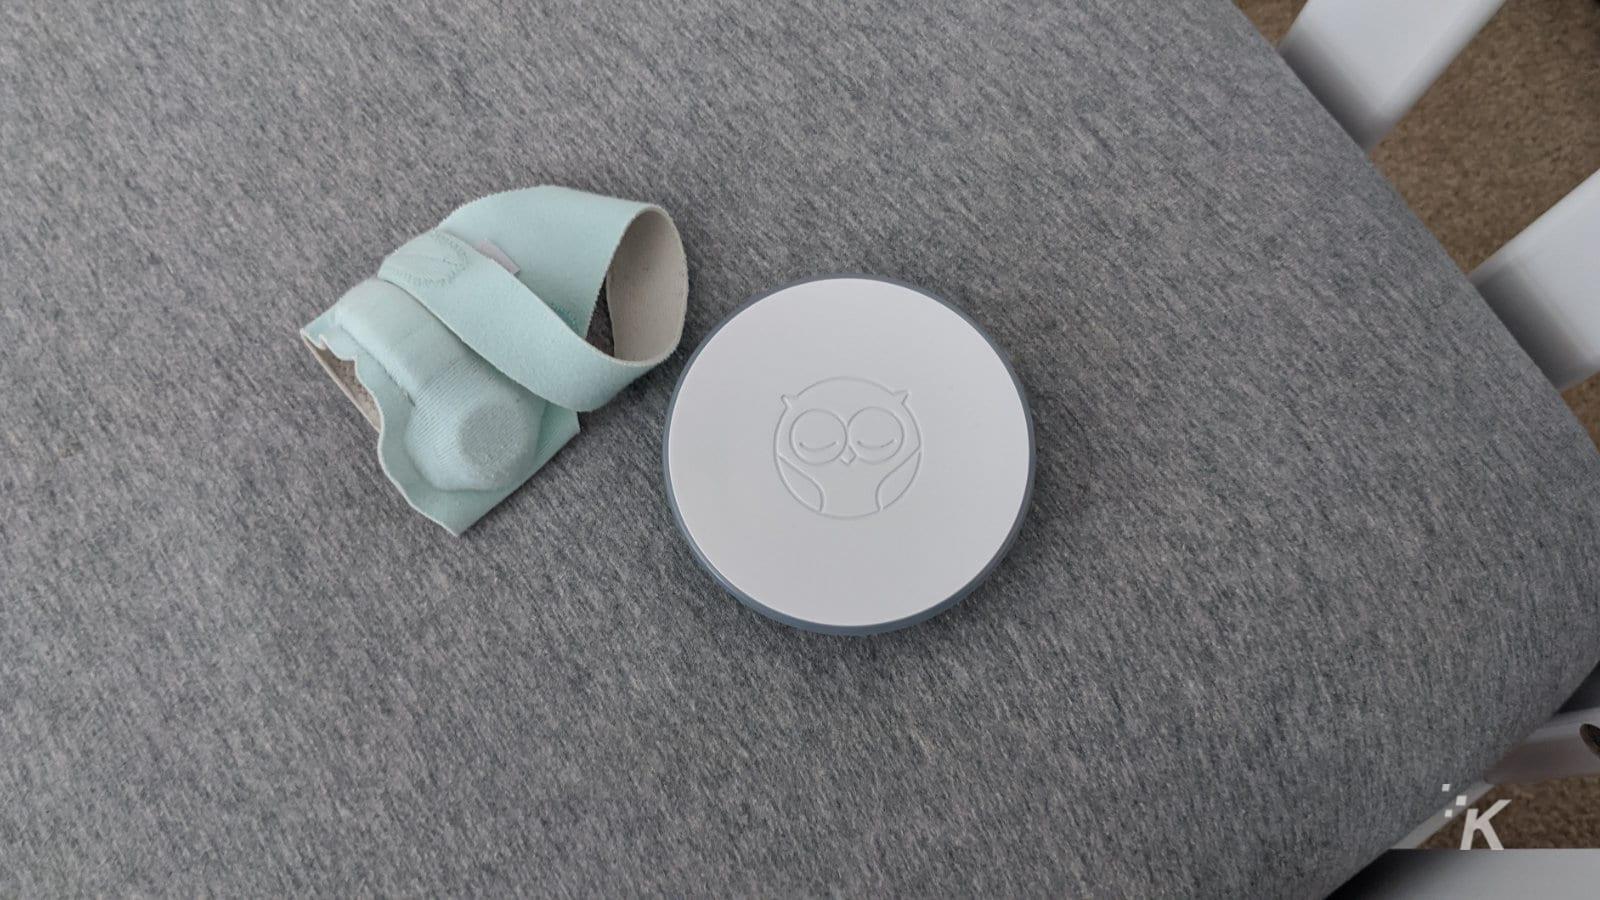 owlet smart sock and base unit on a crib mattress